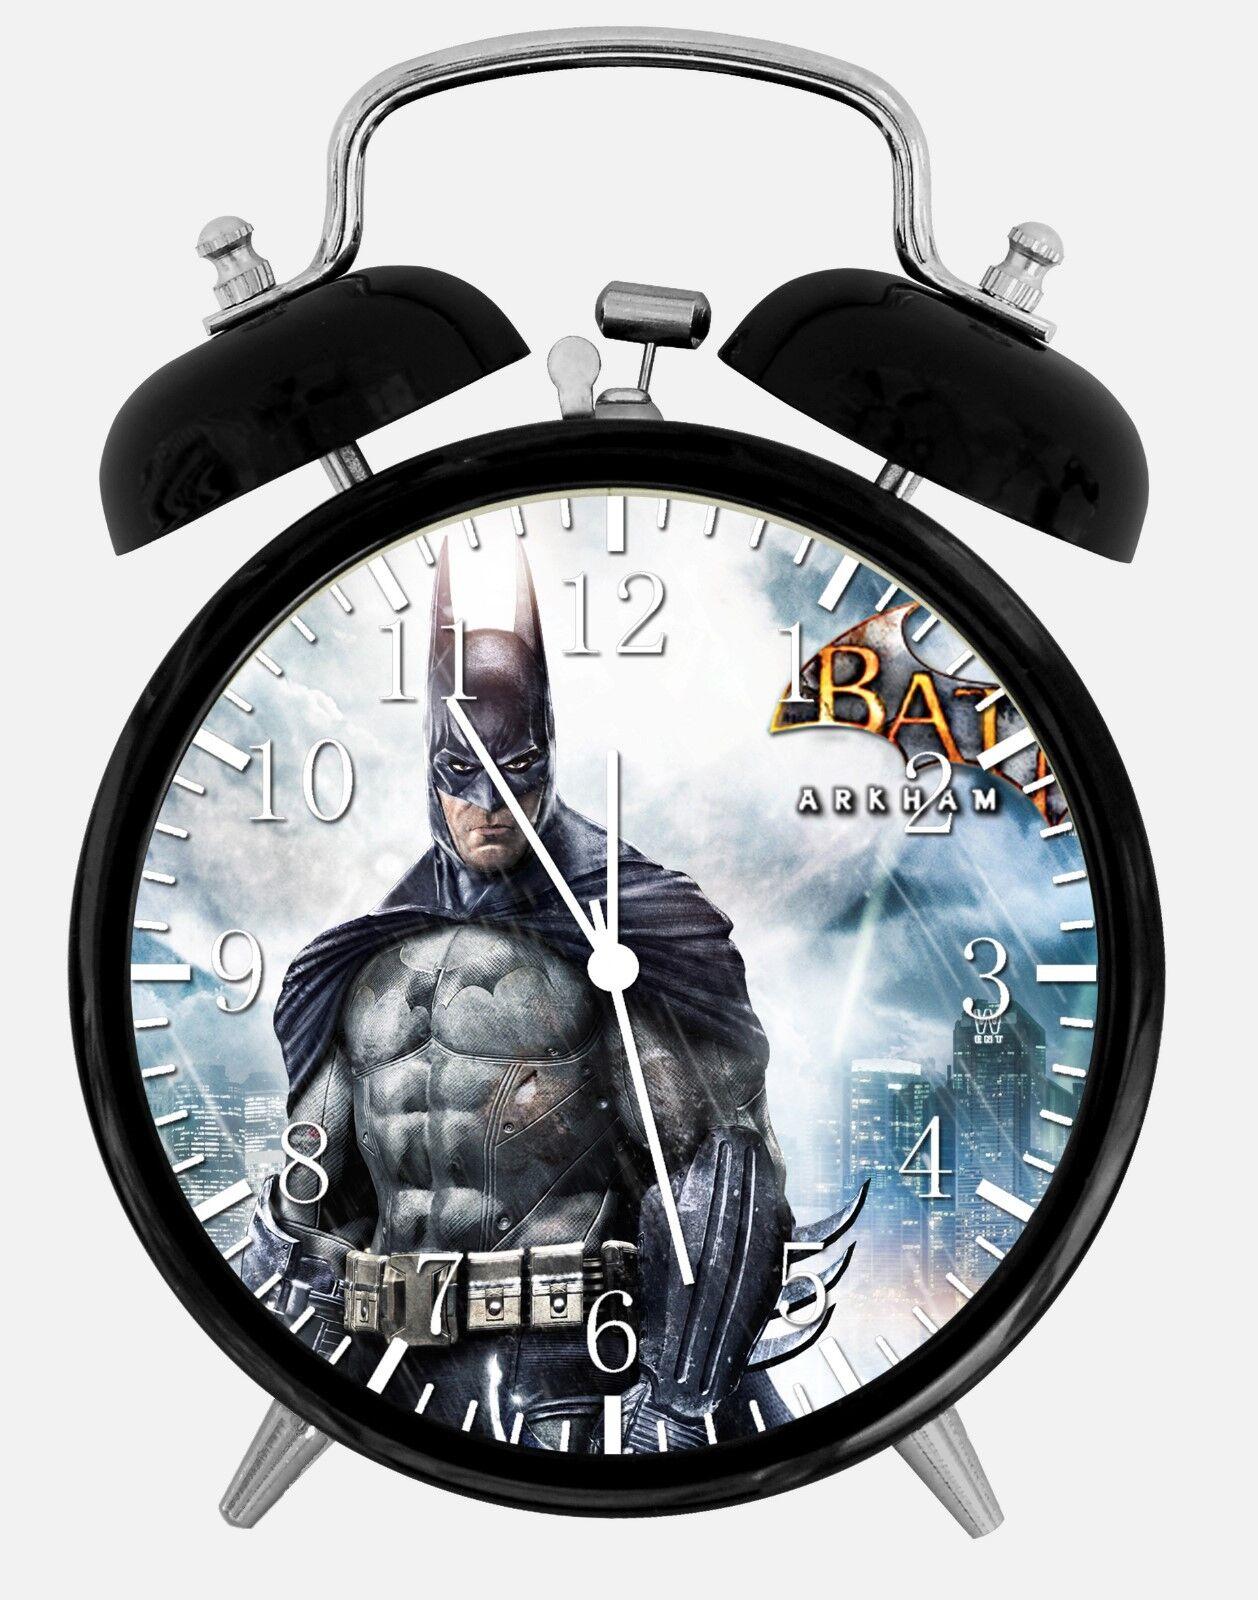 "Batman Alarm Desk Clock 3.75"" Home or Office Decor Y43 Nice For Gift"